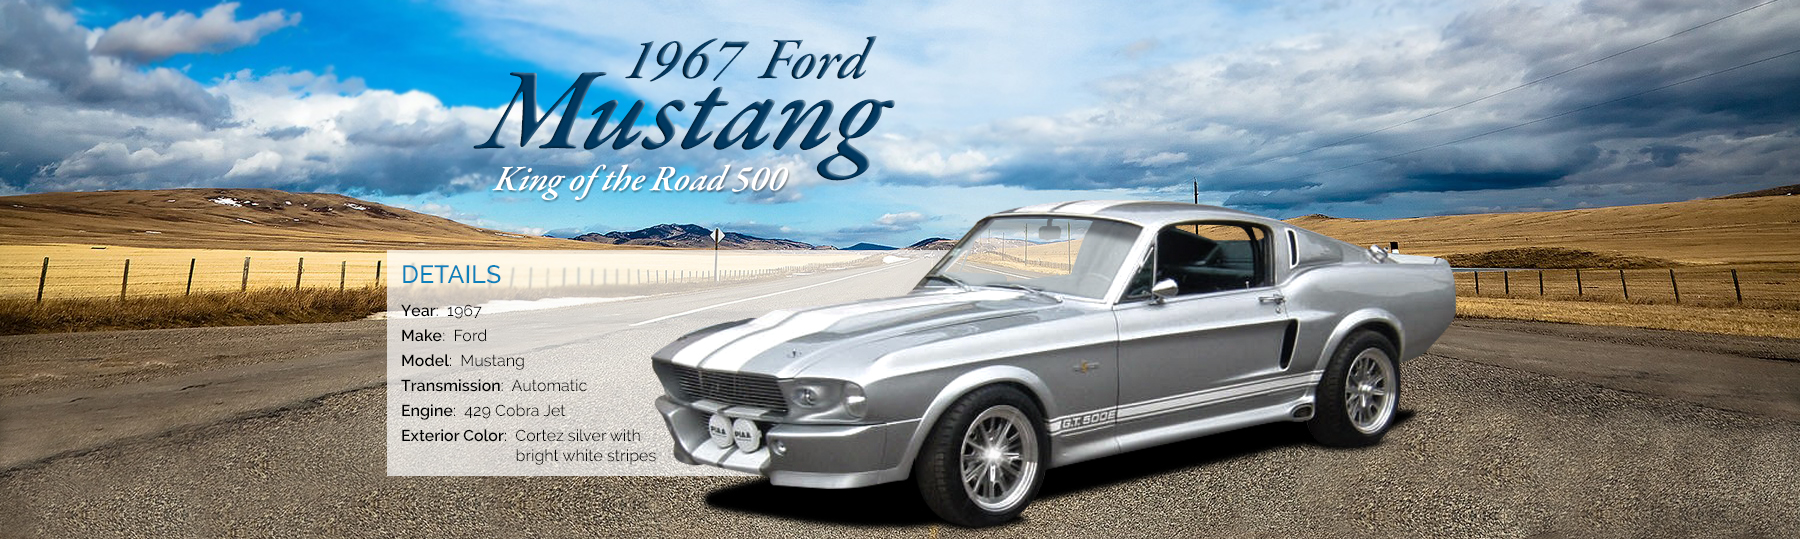 Fineline-67-Mustang-KR-header-1